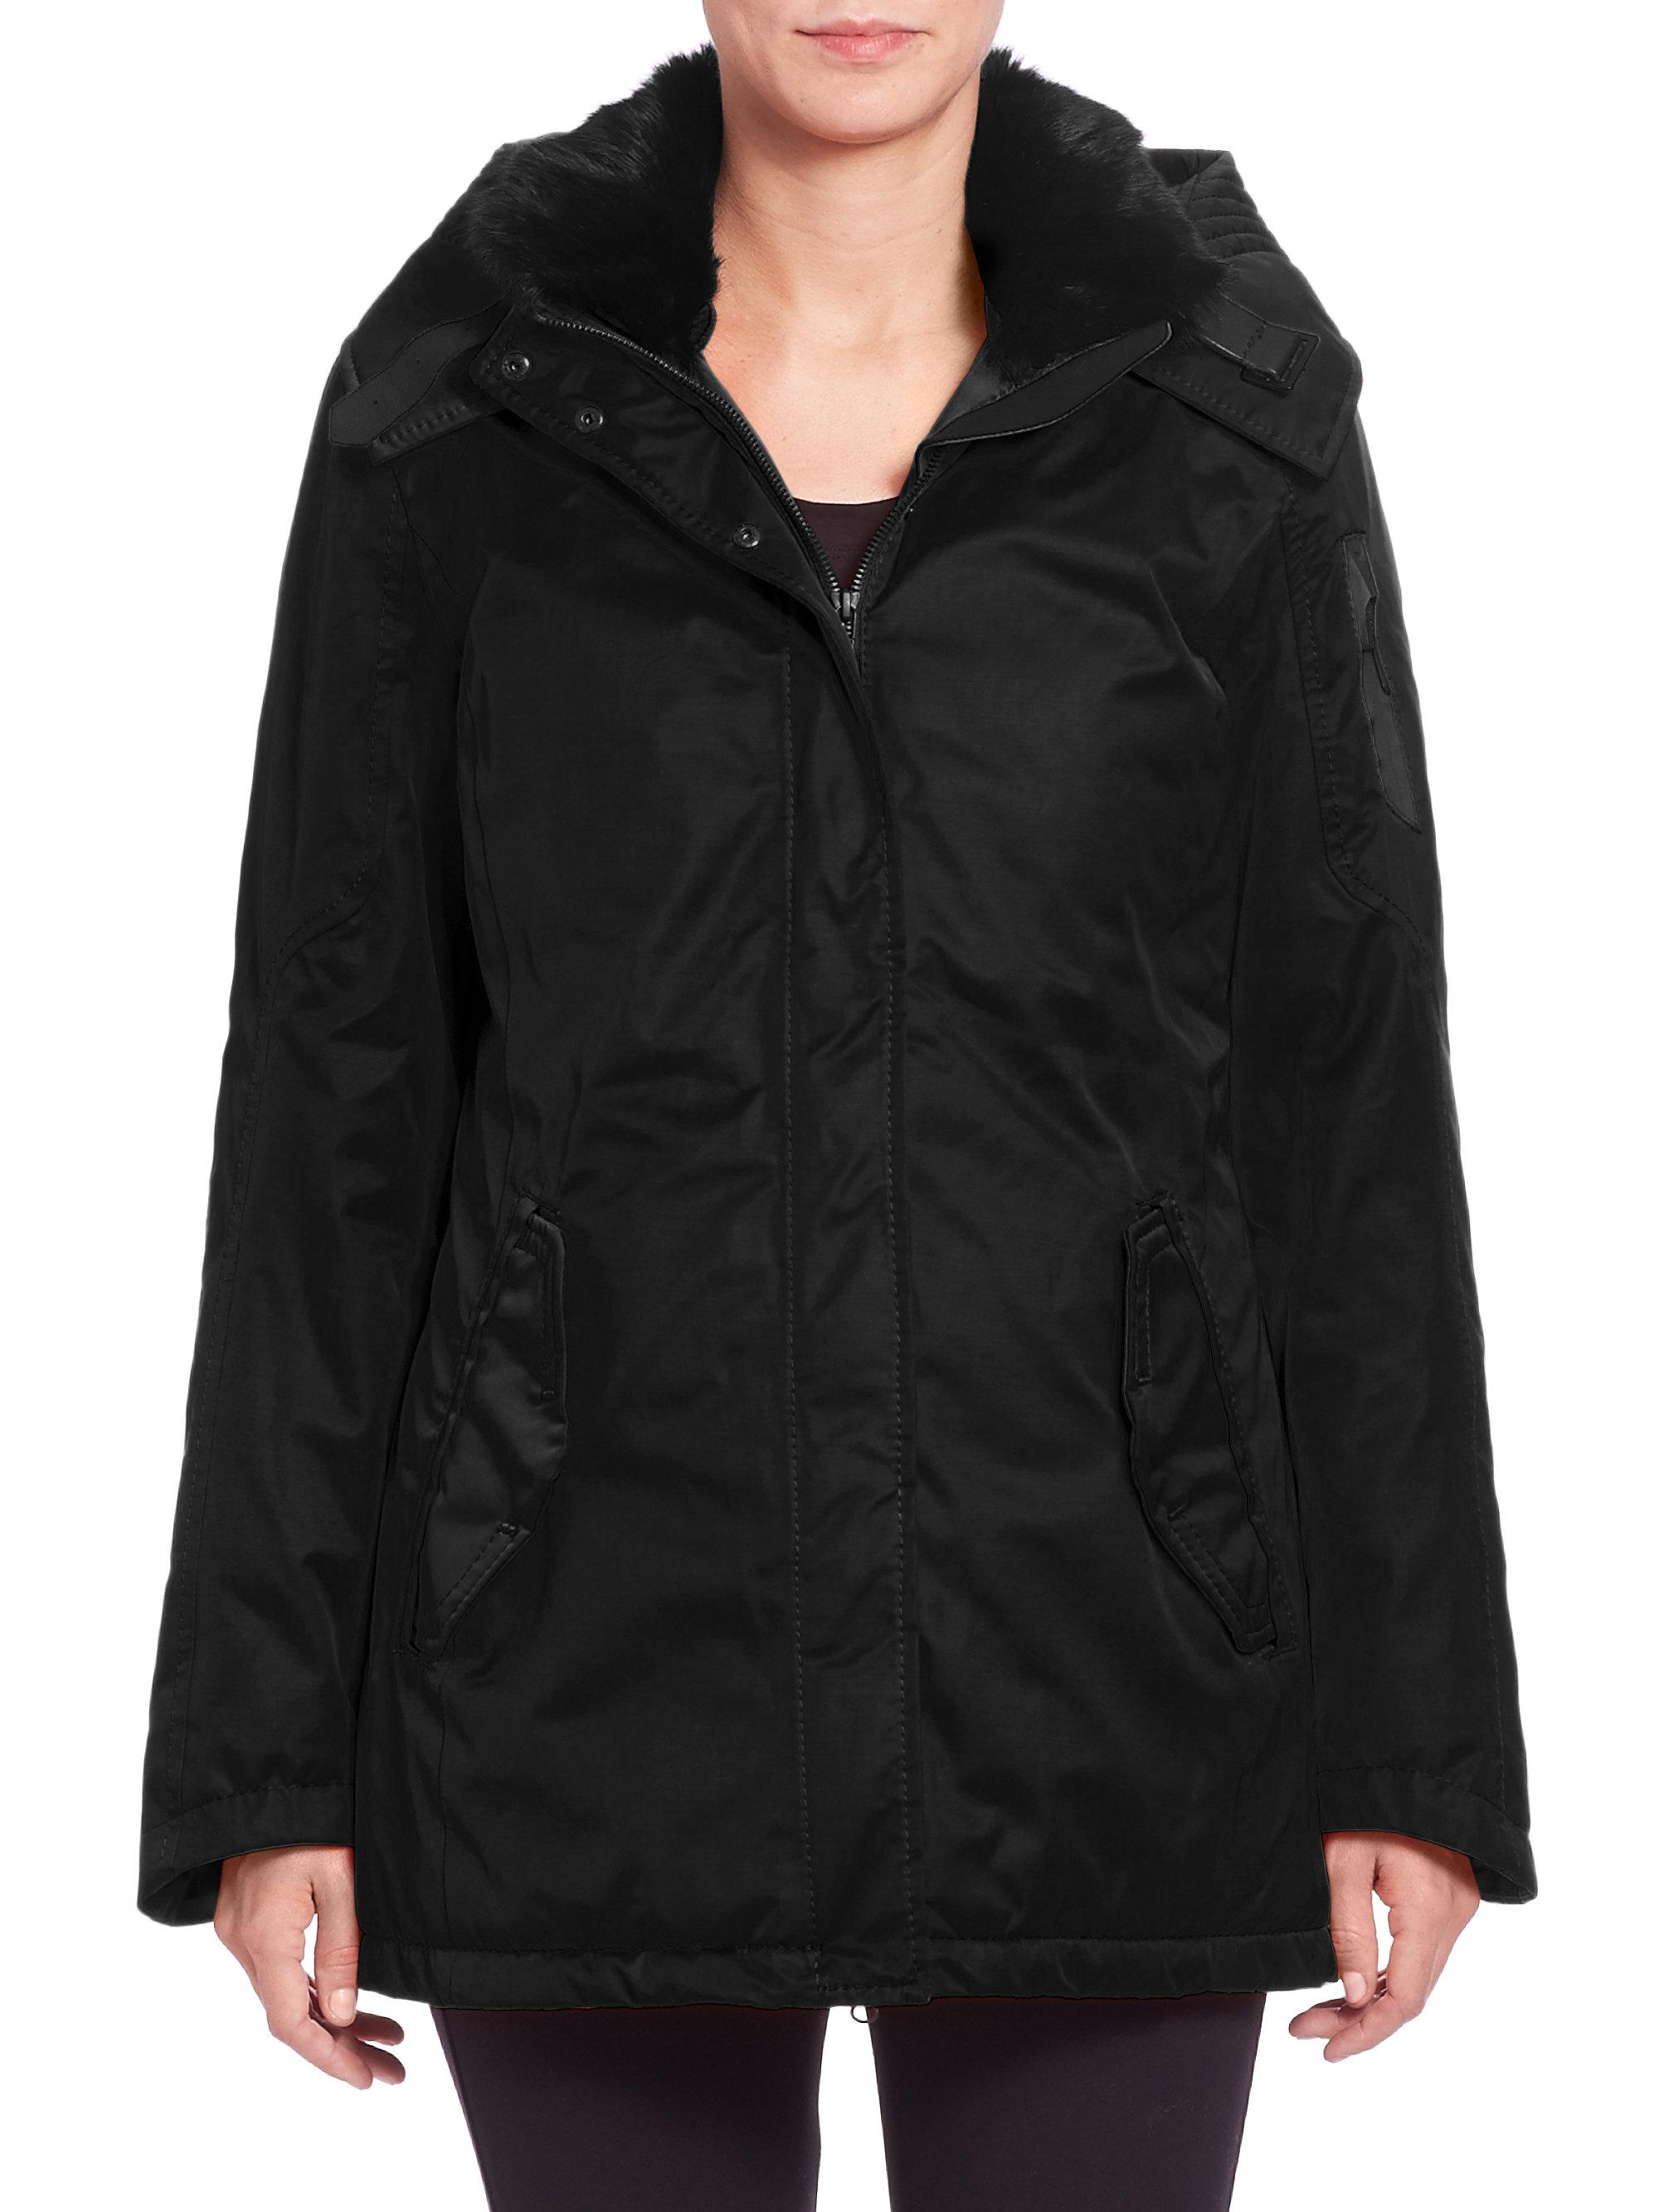 g lab mayfair ii fur collar coat in black lyst. Black Bedroom Furniture Sets. Home Design Ideas